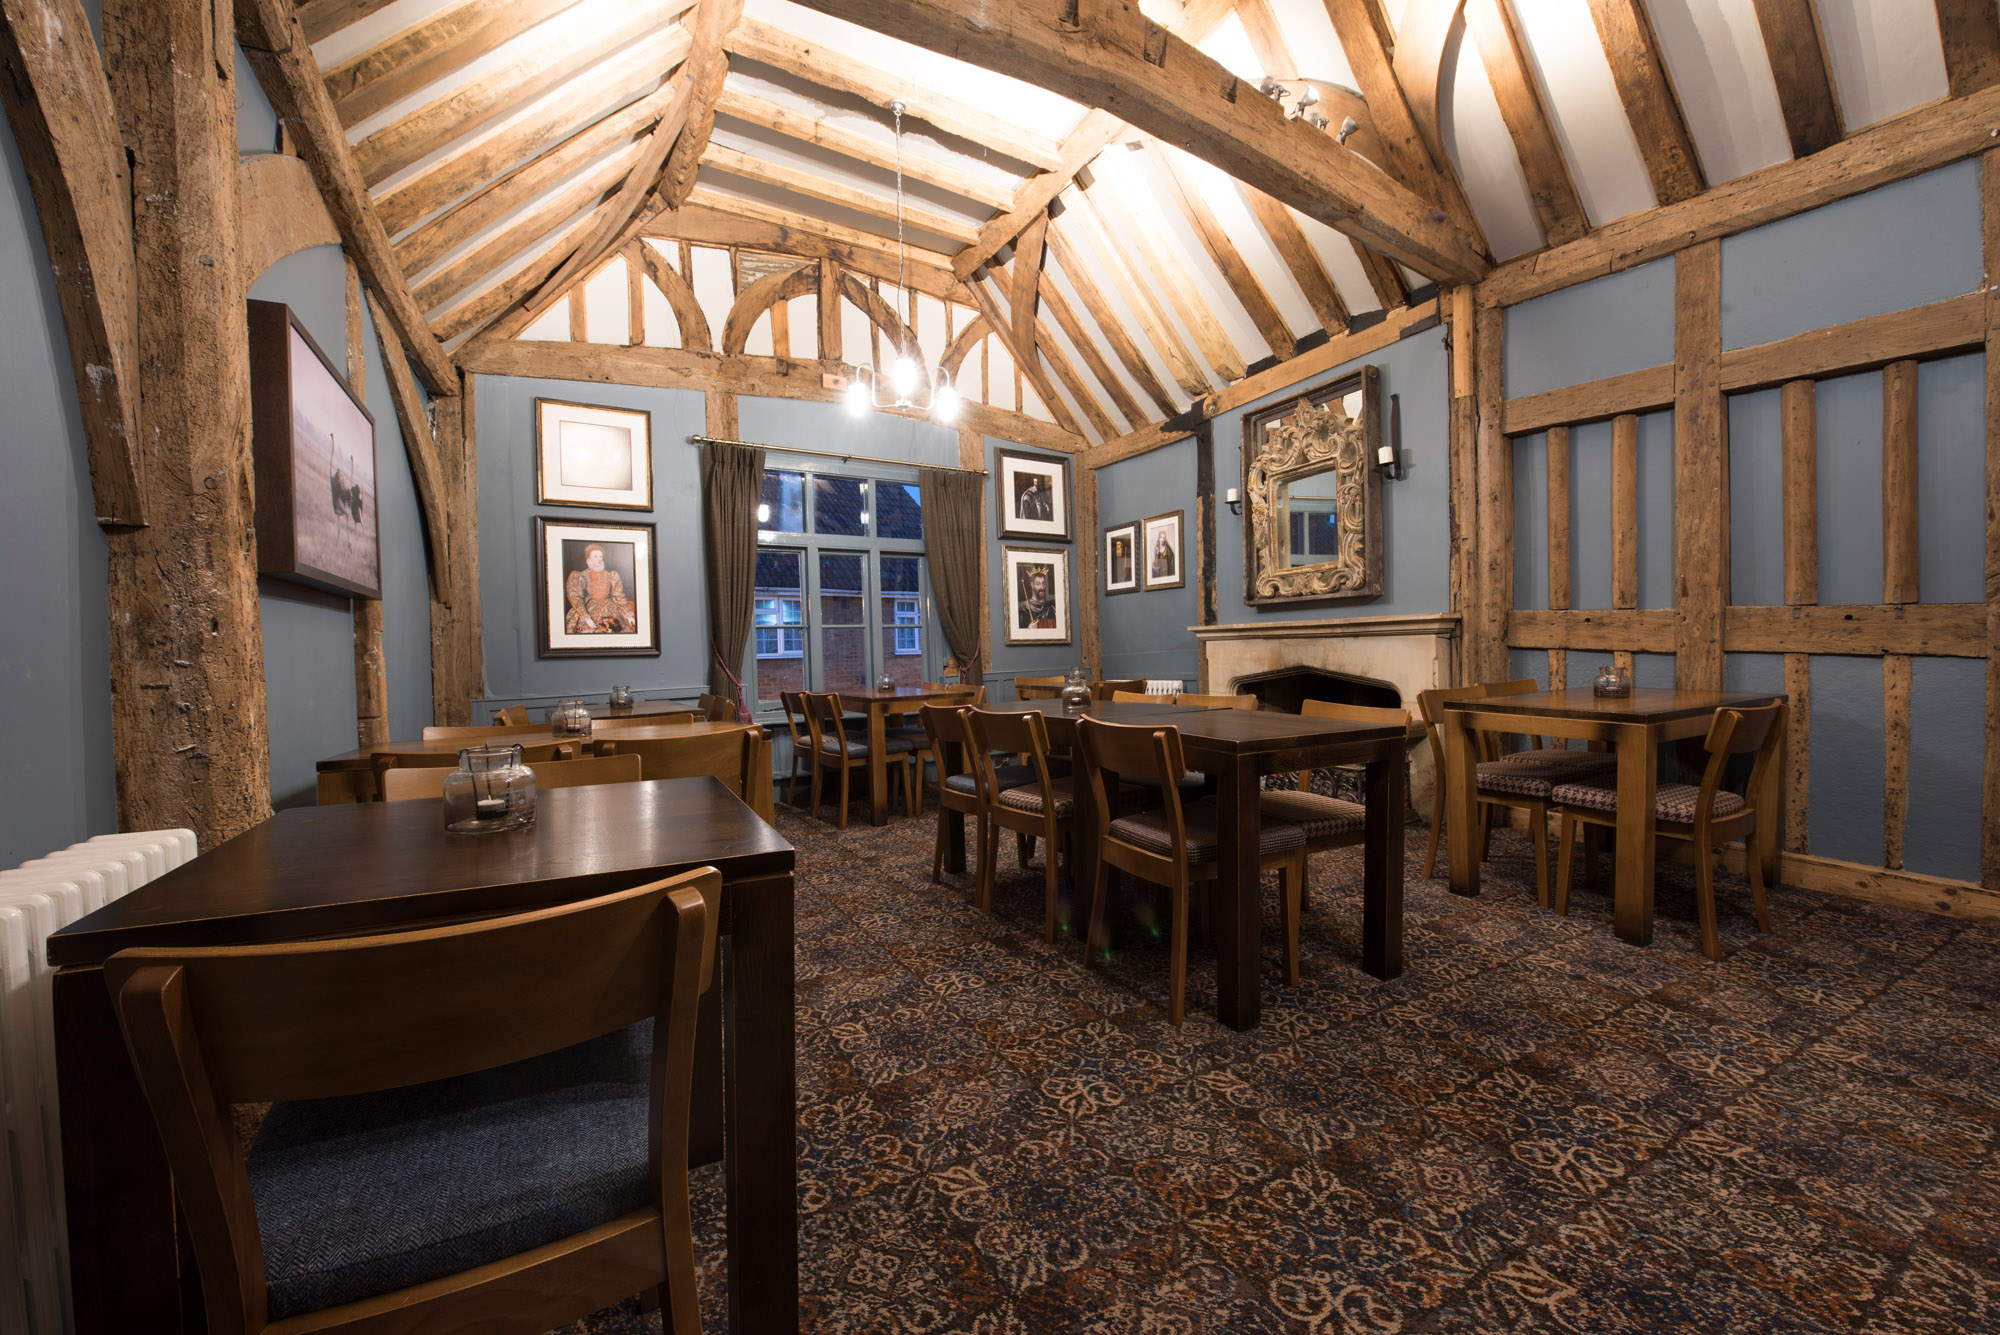 Ostrich Inn, Colnbrook near Heathrow